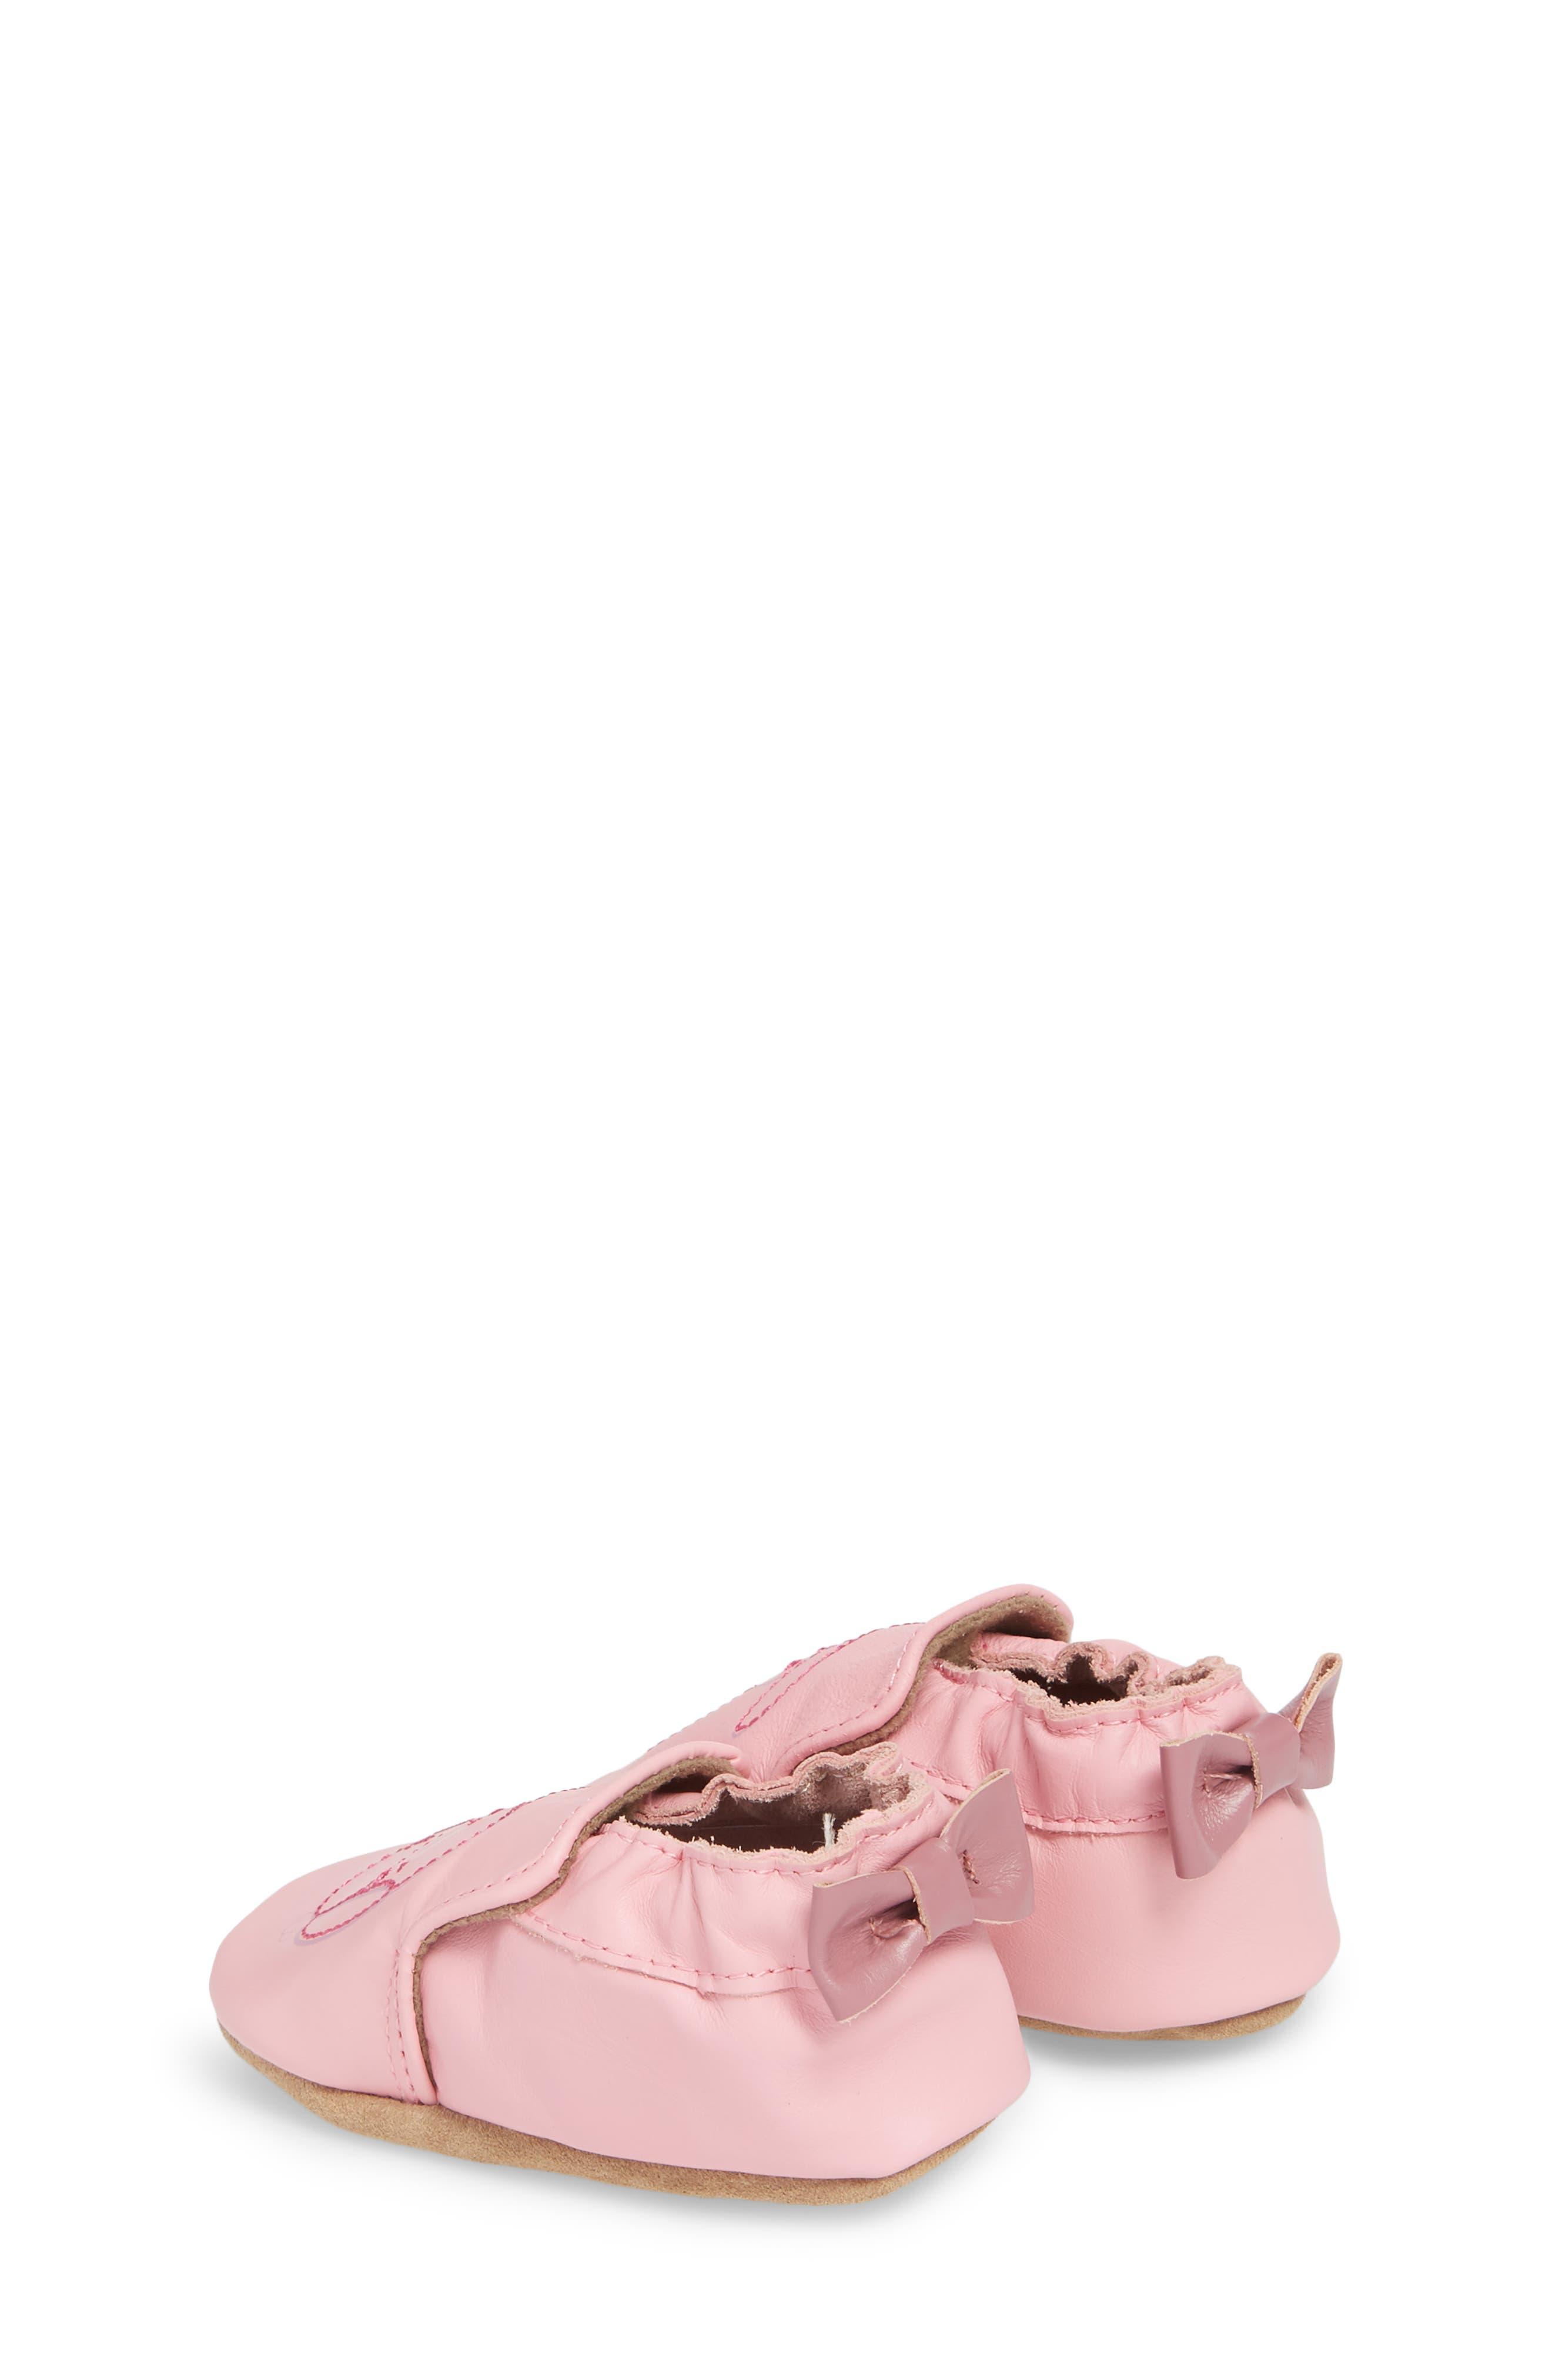 Sweet Bunny Moccasin Crib Shoe,                             Alternate thumbnail 2, color,                             Pastel Pink